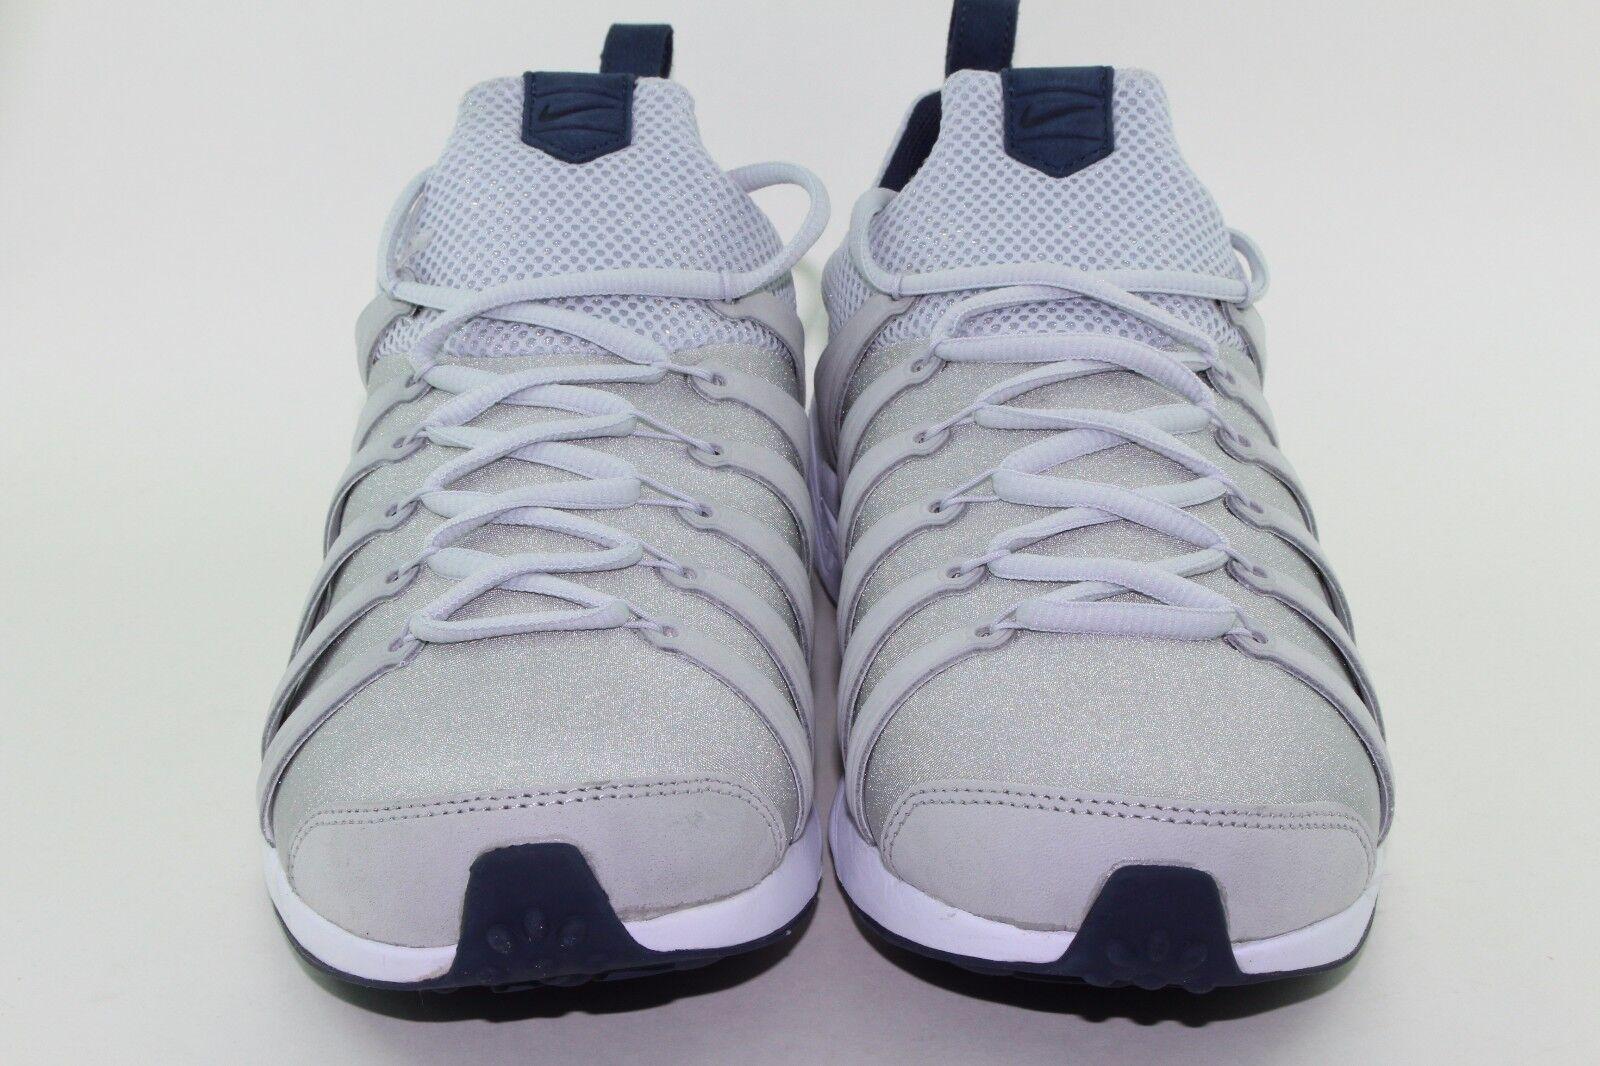 Nike laboratorio air zoom spirimic uomini dimensioni 9,0 metallico raro raro raro platino nuova luce legale   Beni diversi    Uomini/Donne Scarpa  8a2fbc